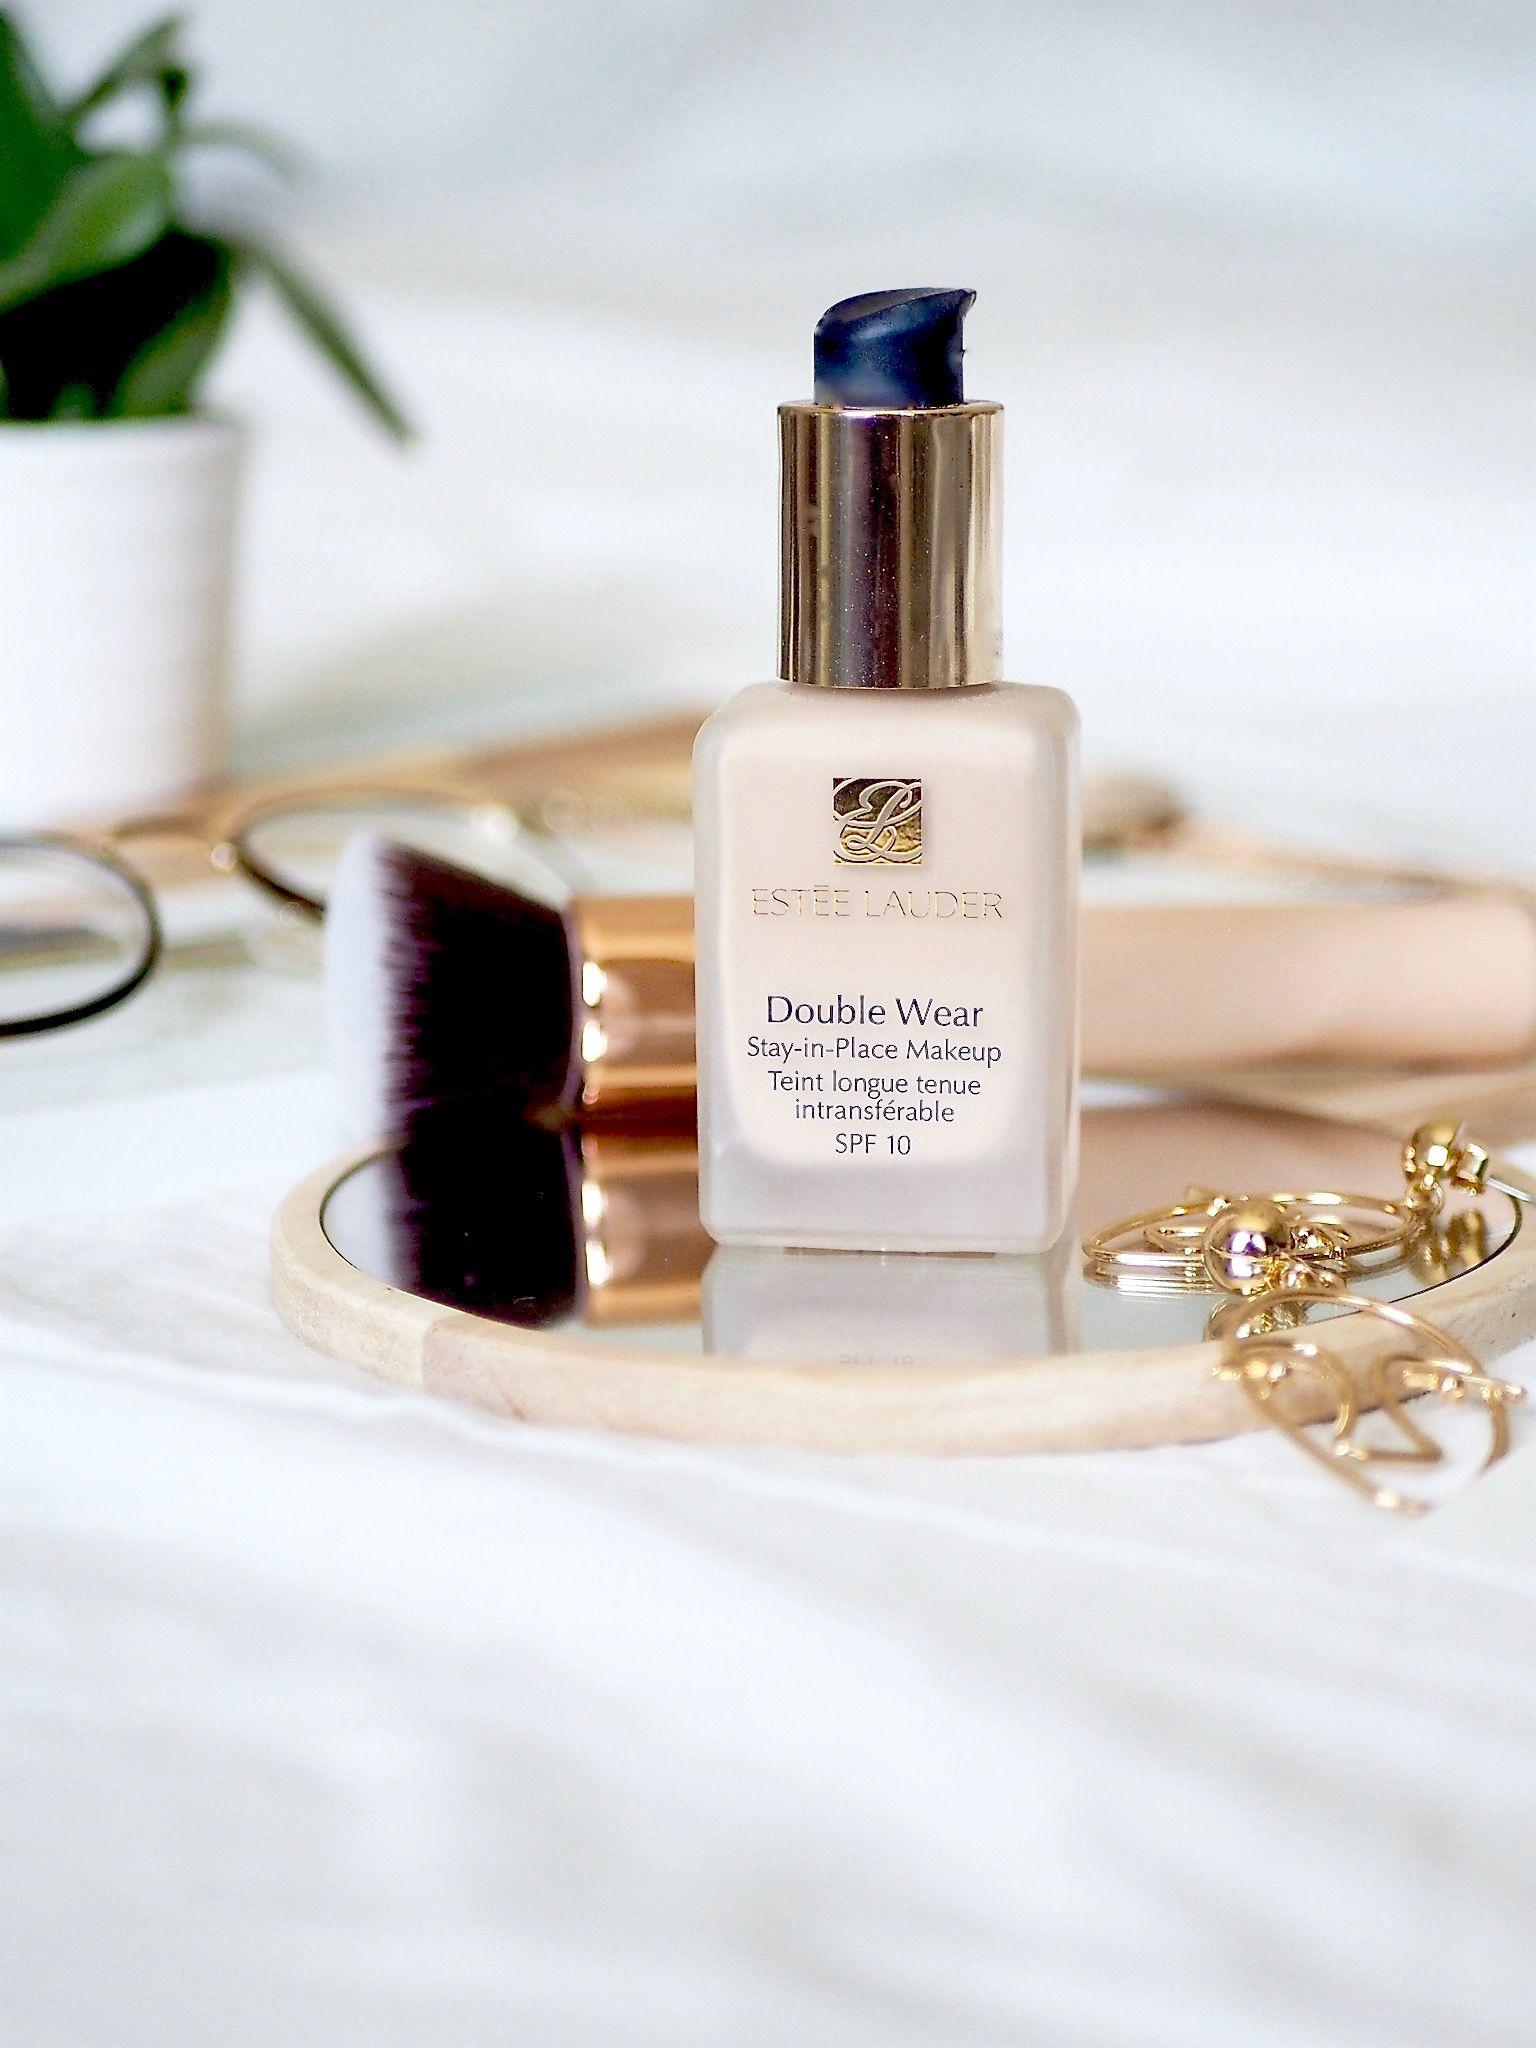 Estee Lauder Double Wear StayinPlace Makeup Review (2020